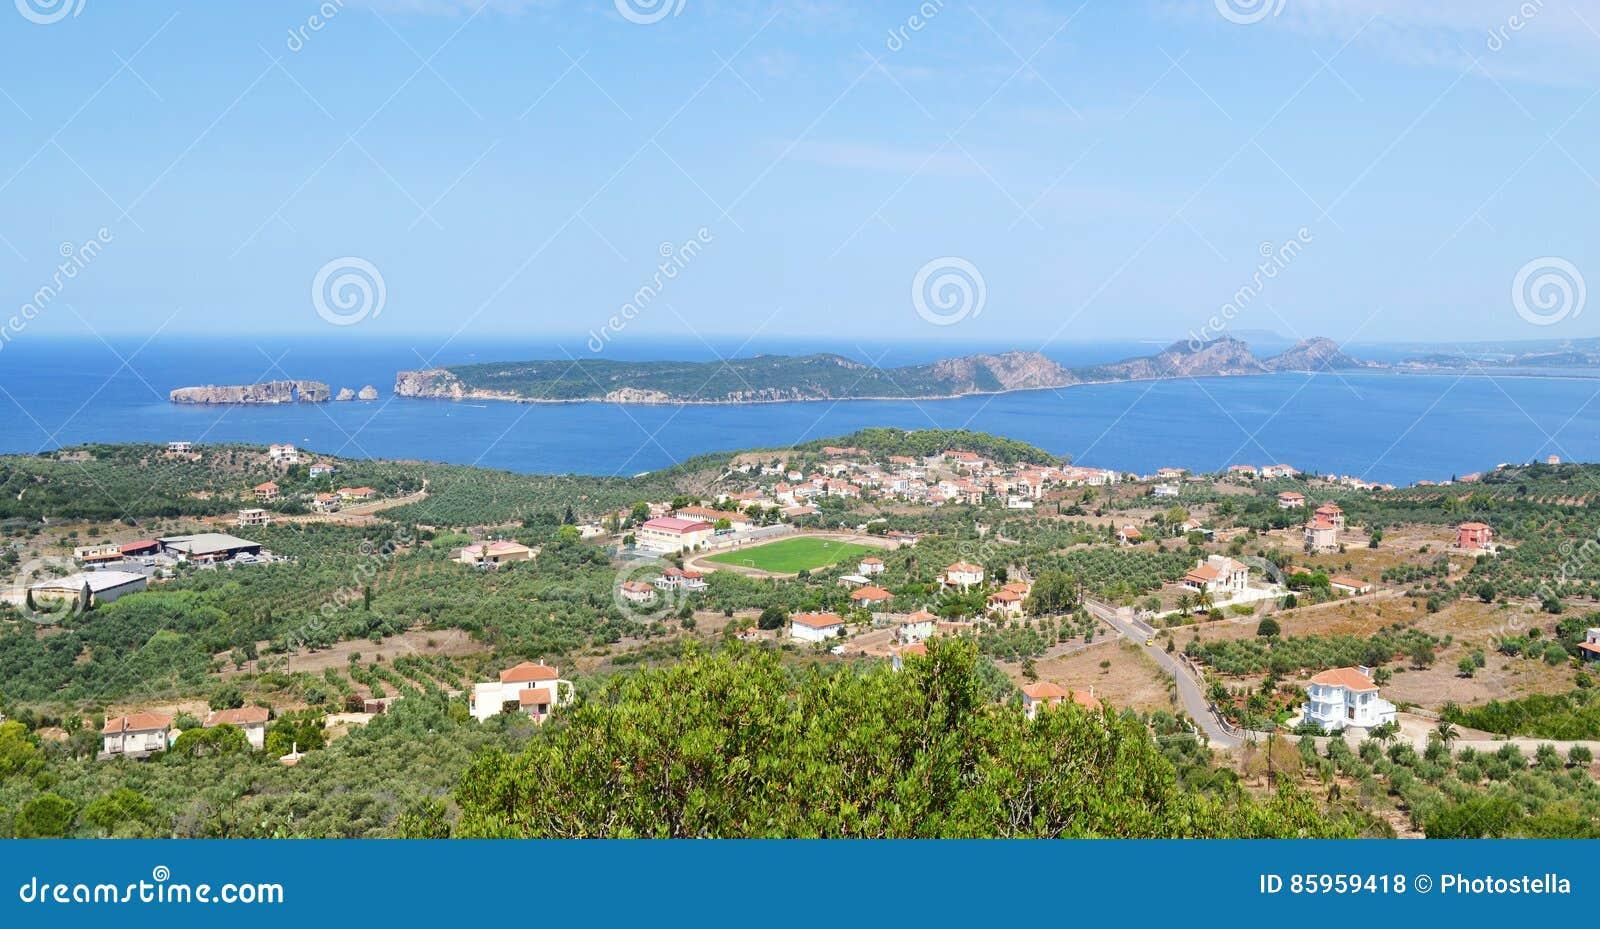 Landscape of Navarino bay and Sphacteria island Peloponnese Greece